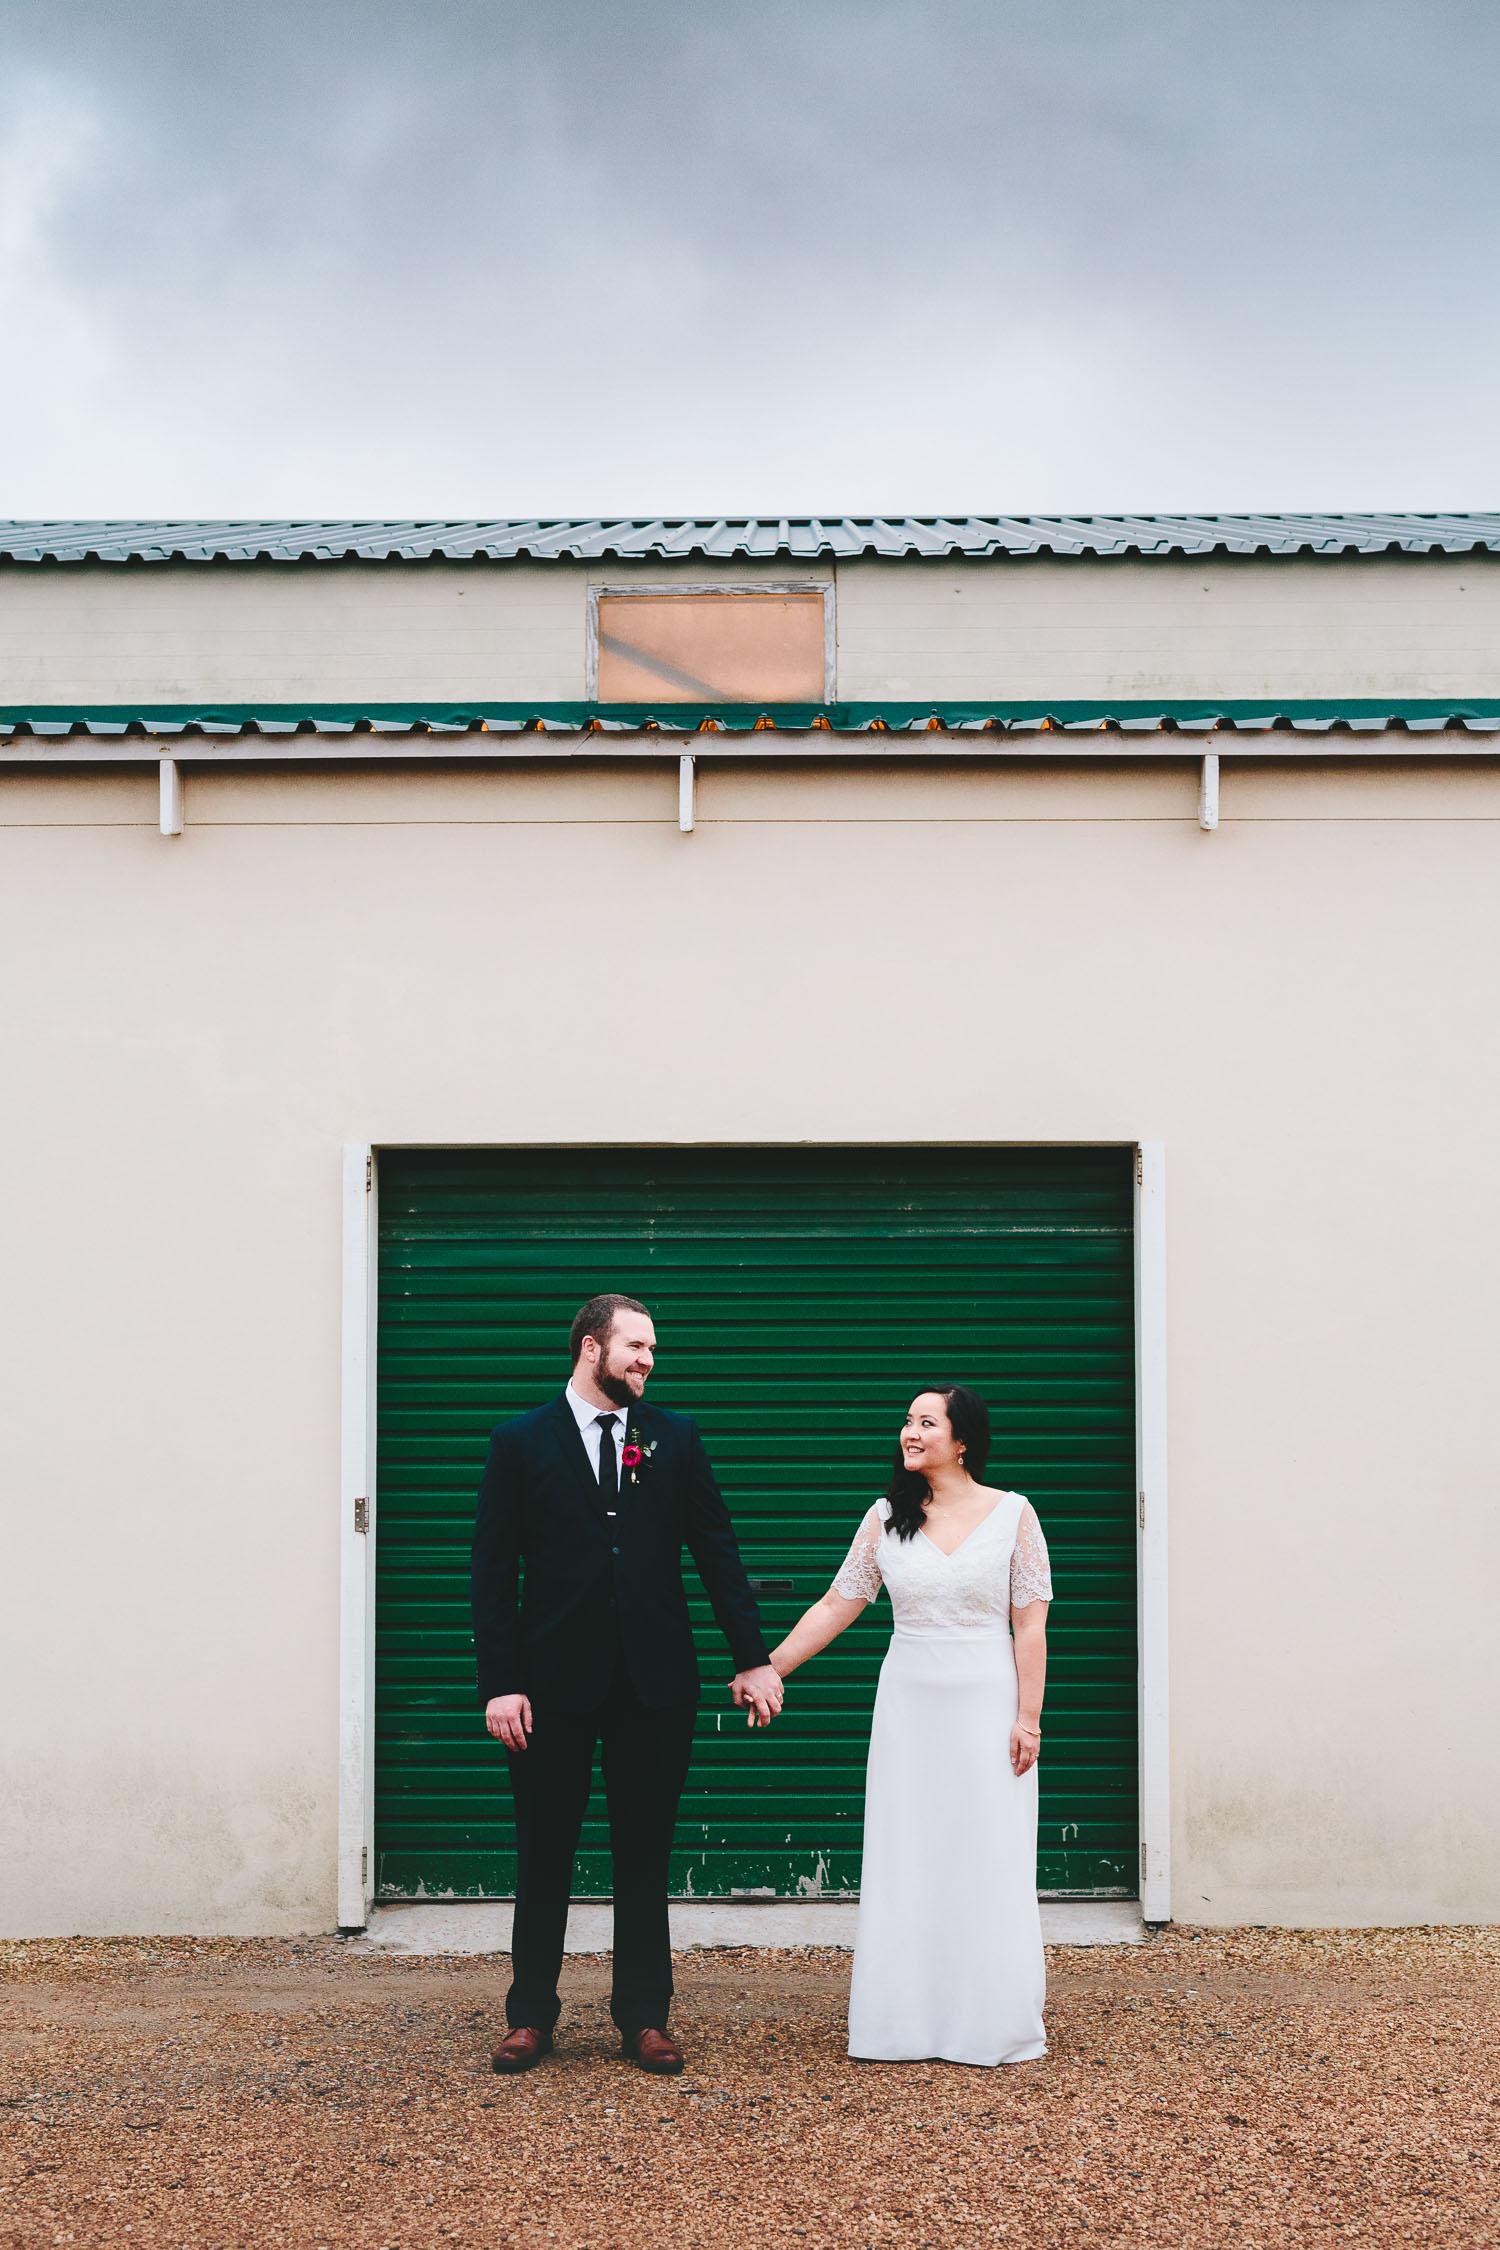 Anne-Craig-Eastern-Cape-Wedding-St-Francis-FiveElements-115.jpg